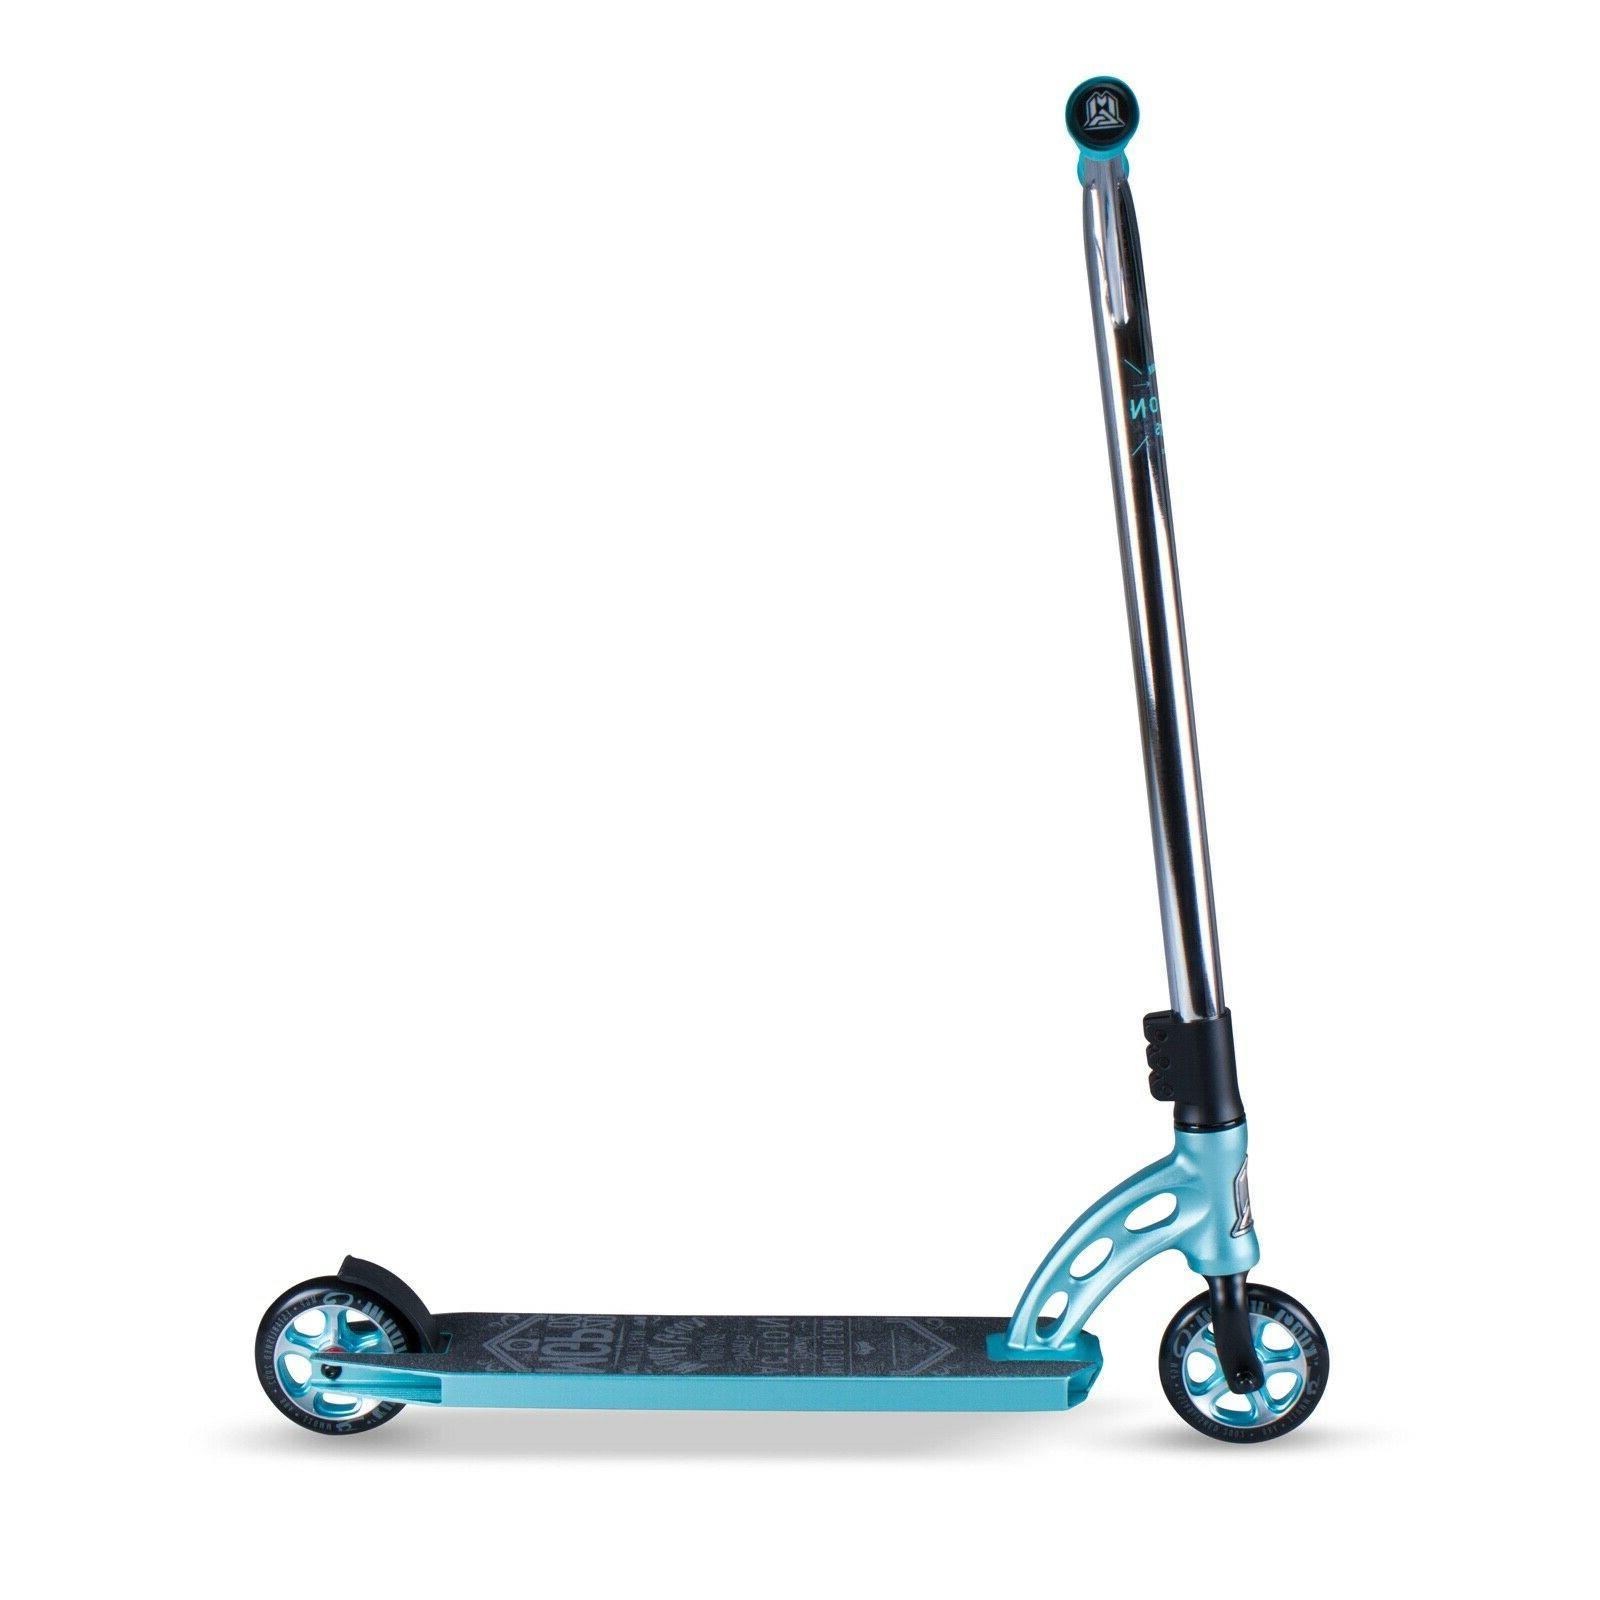 Madd Gear Team Scooter